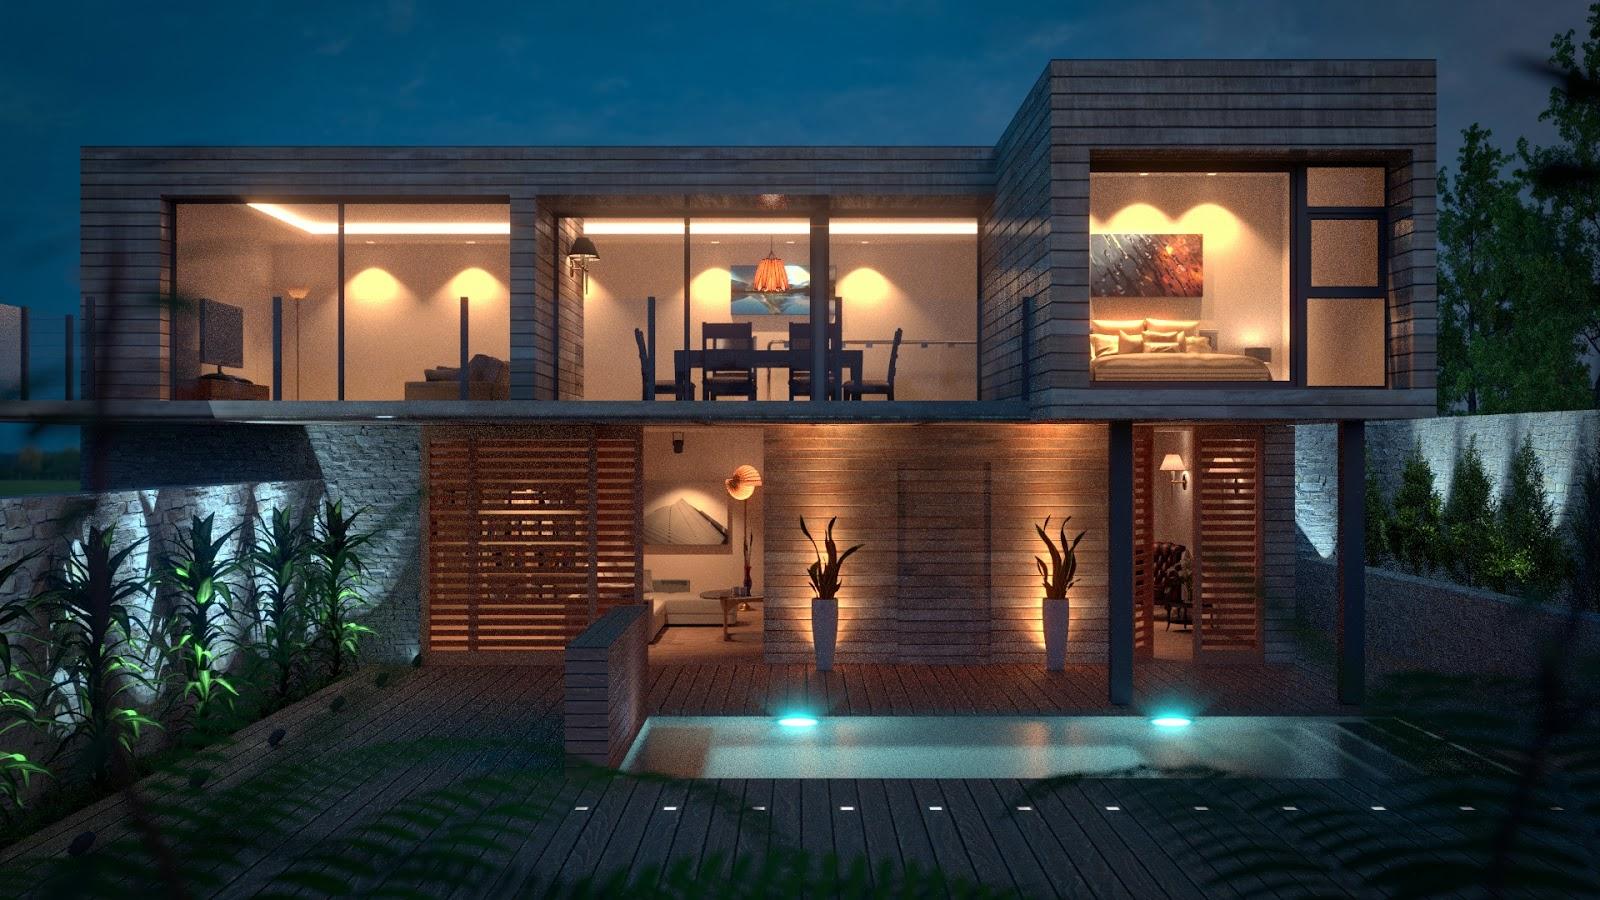 Artwork On Screen Pool Deck House Model Blender Render